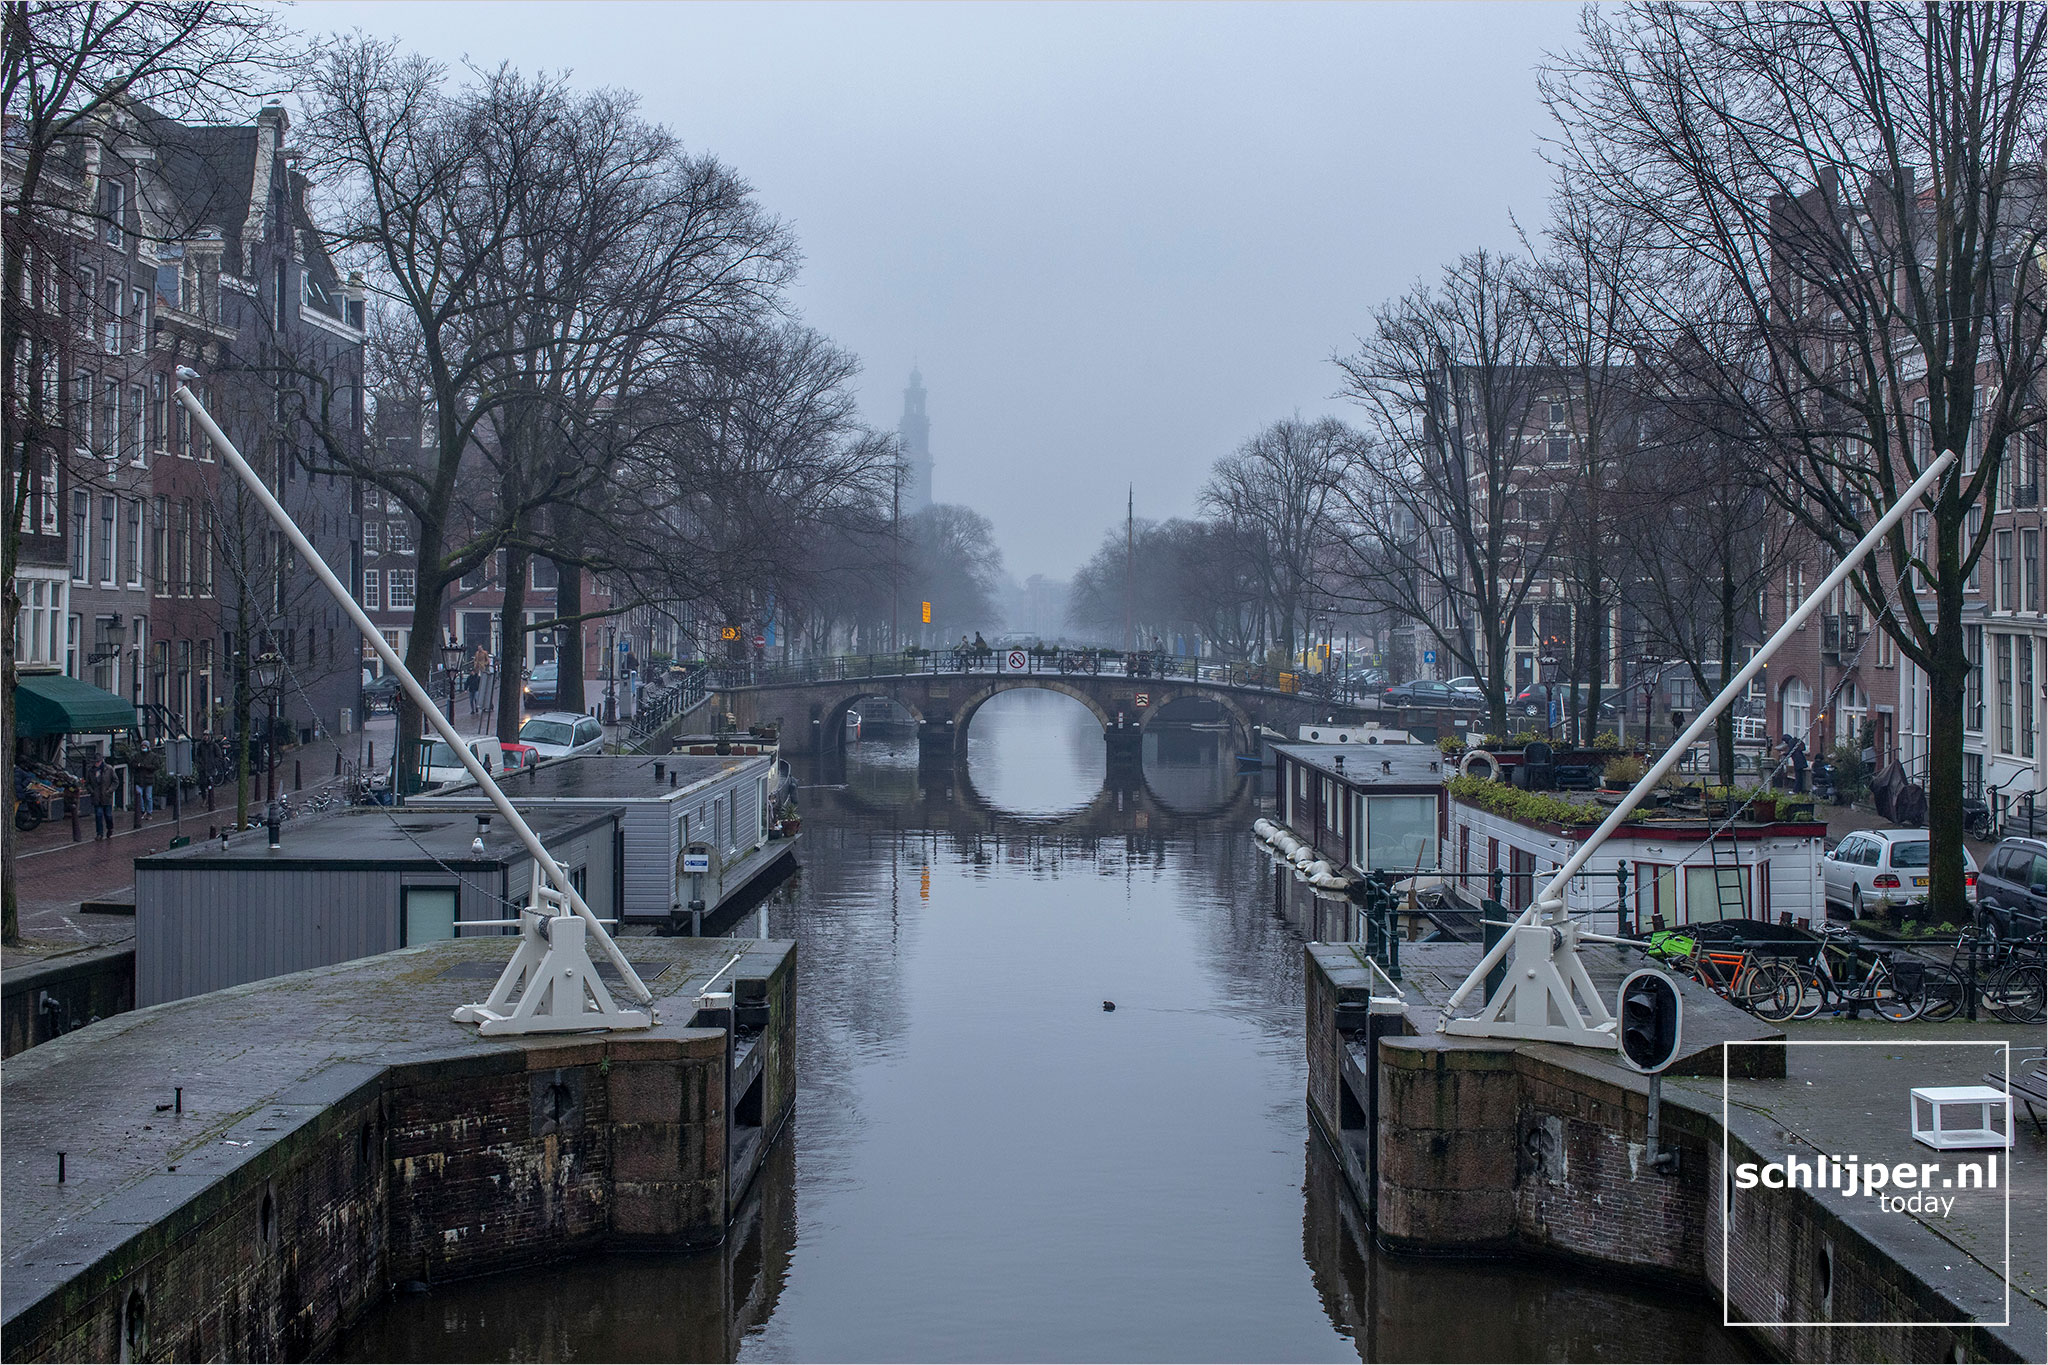 The Netherlands, Amsterdam, 1 februari 2021